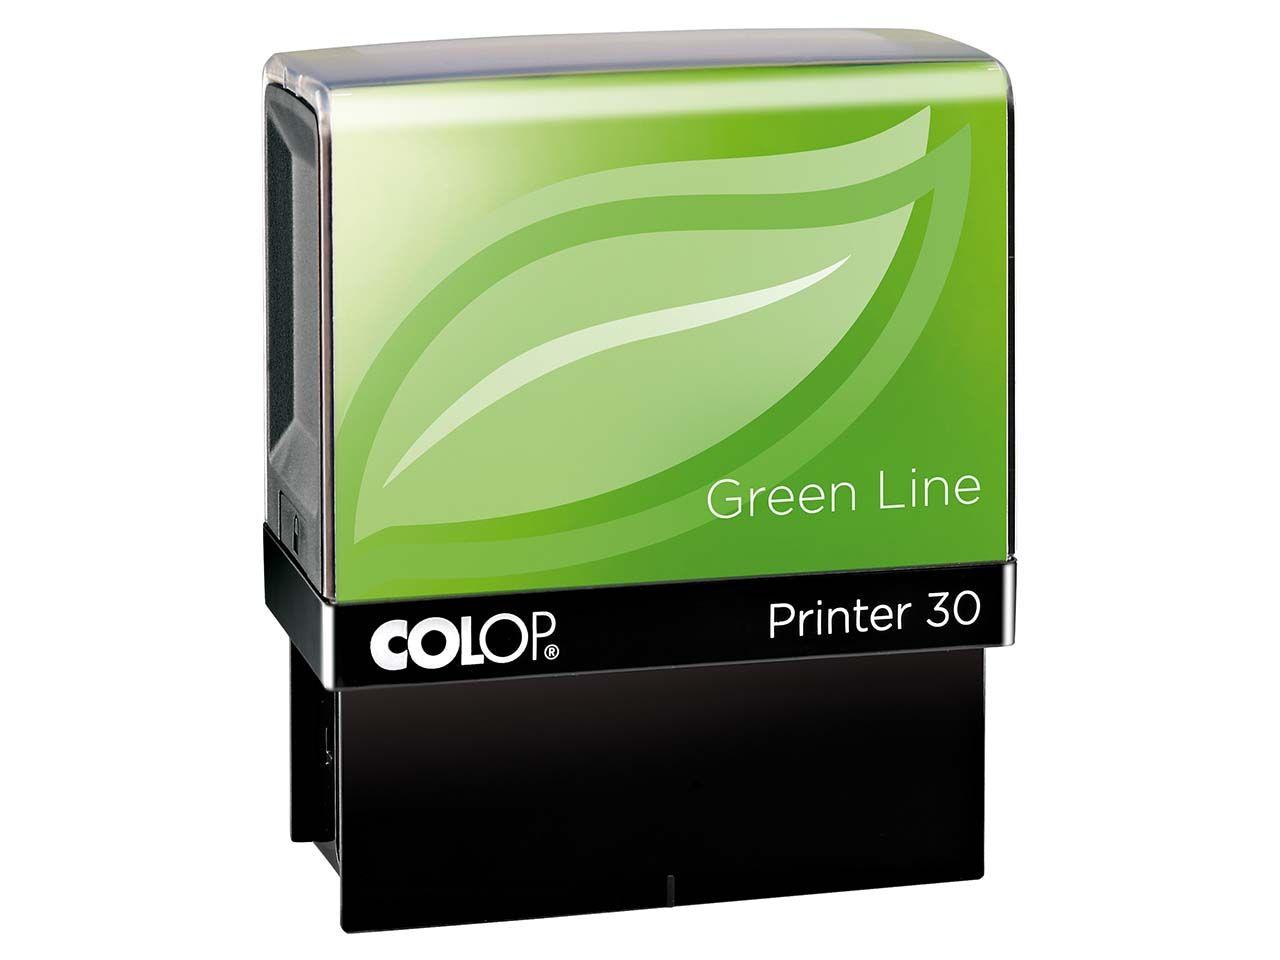 Colop Stempel Green Line